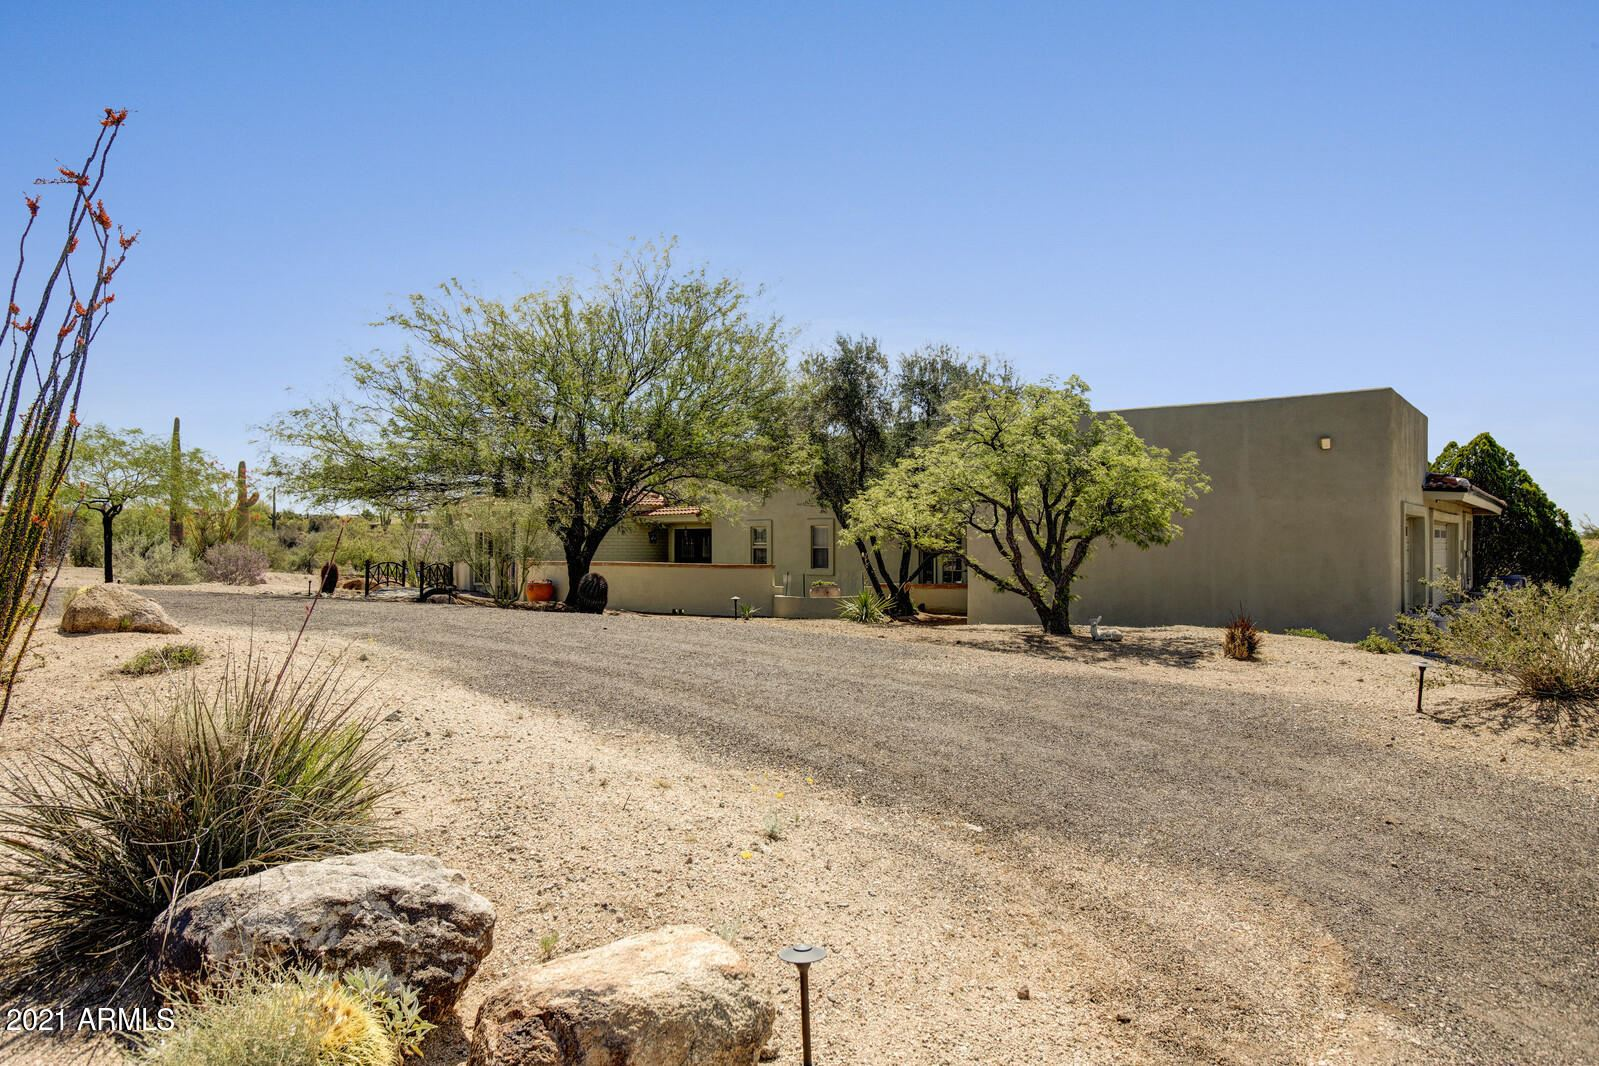 Photo of 36633 N STARDUST Lane, Carefree, AZ 85377 (MLS # 6231802)